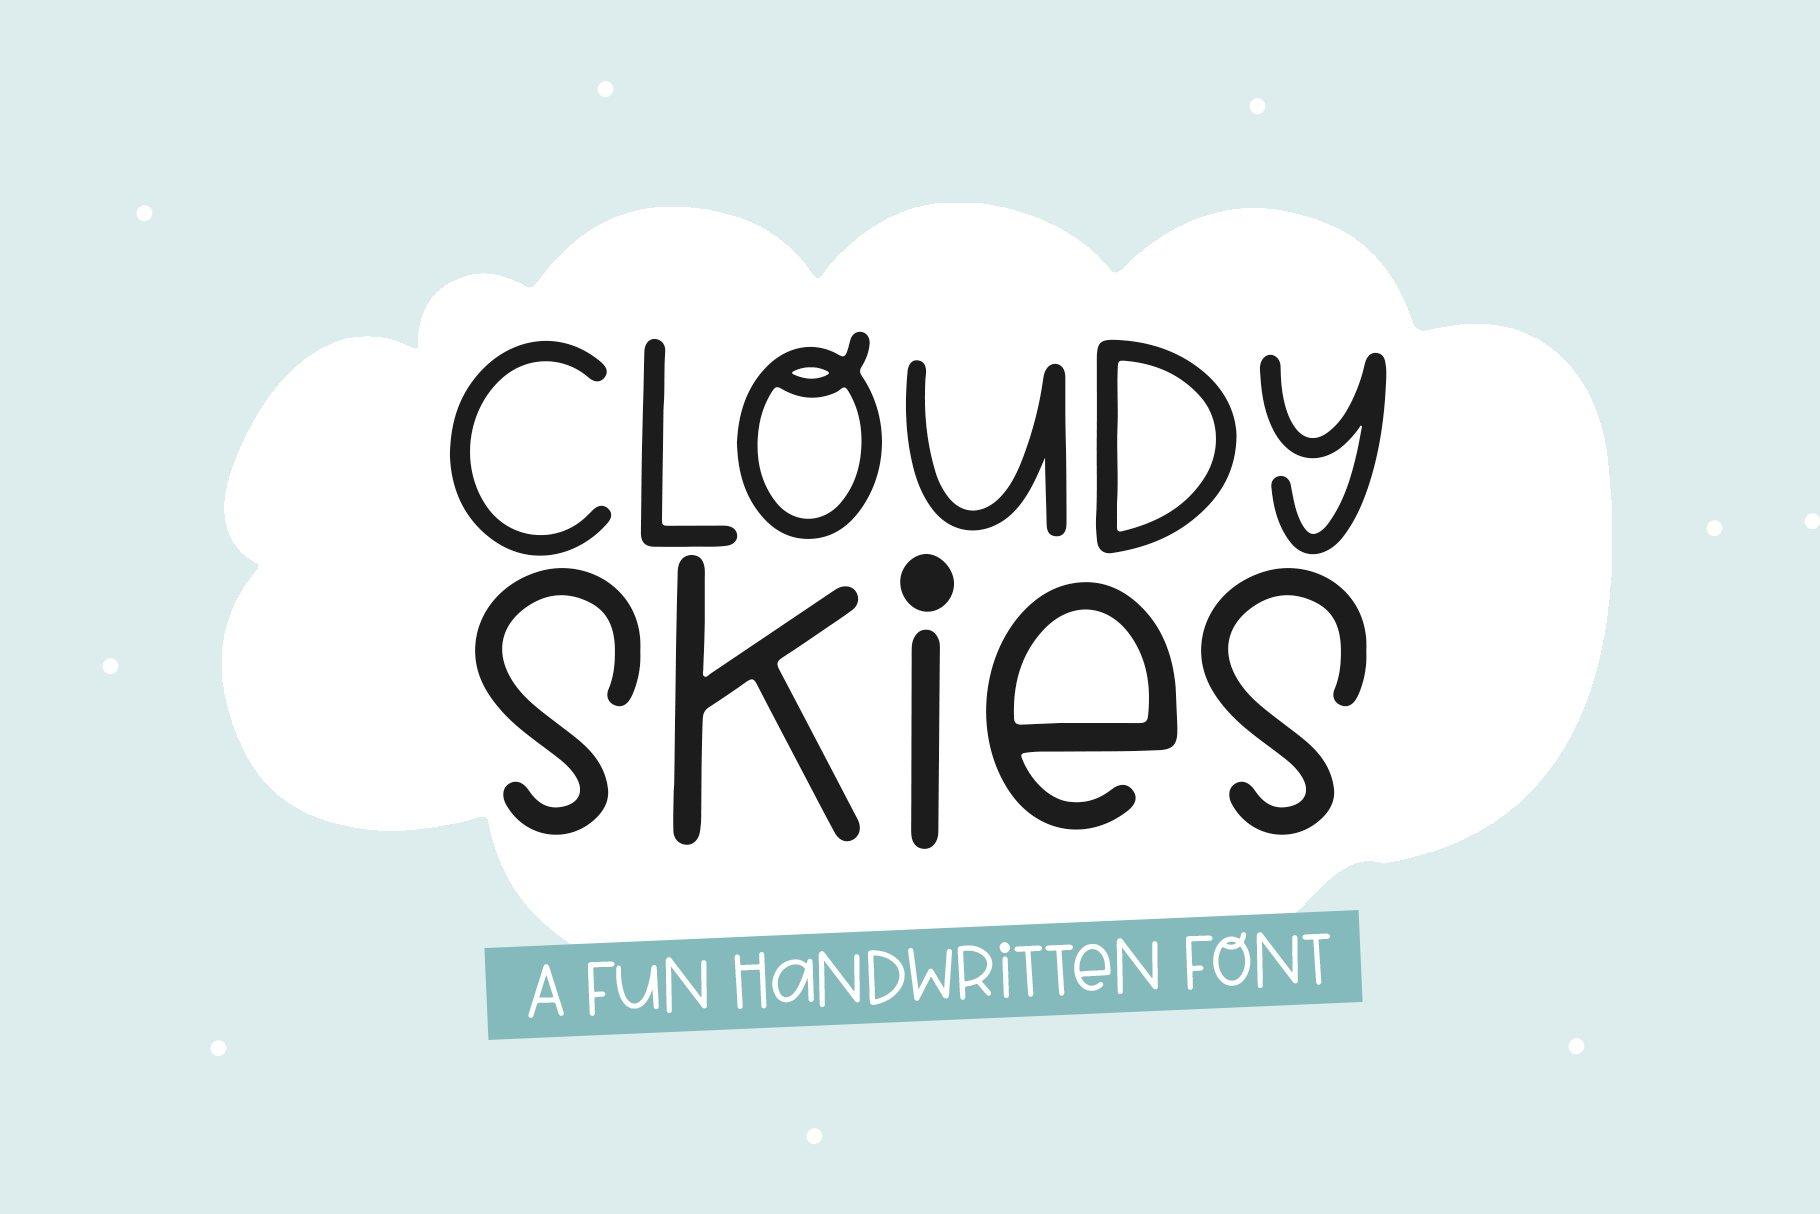 Cloudy Skies - A Fun Handwritten Font example image 1